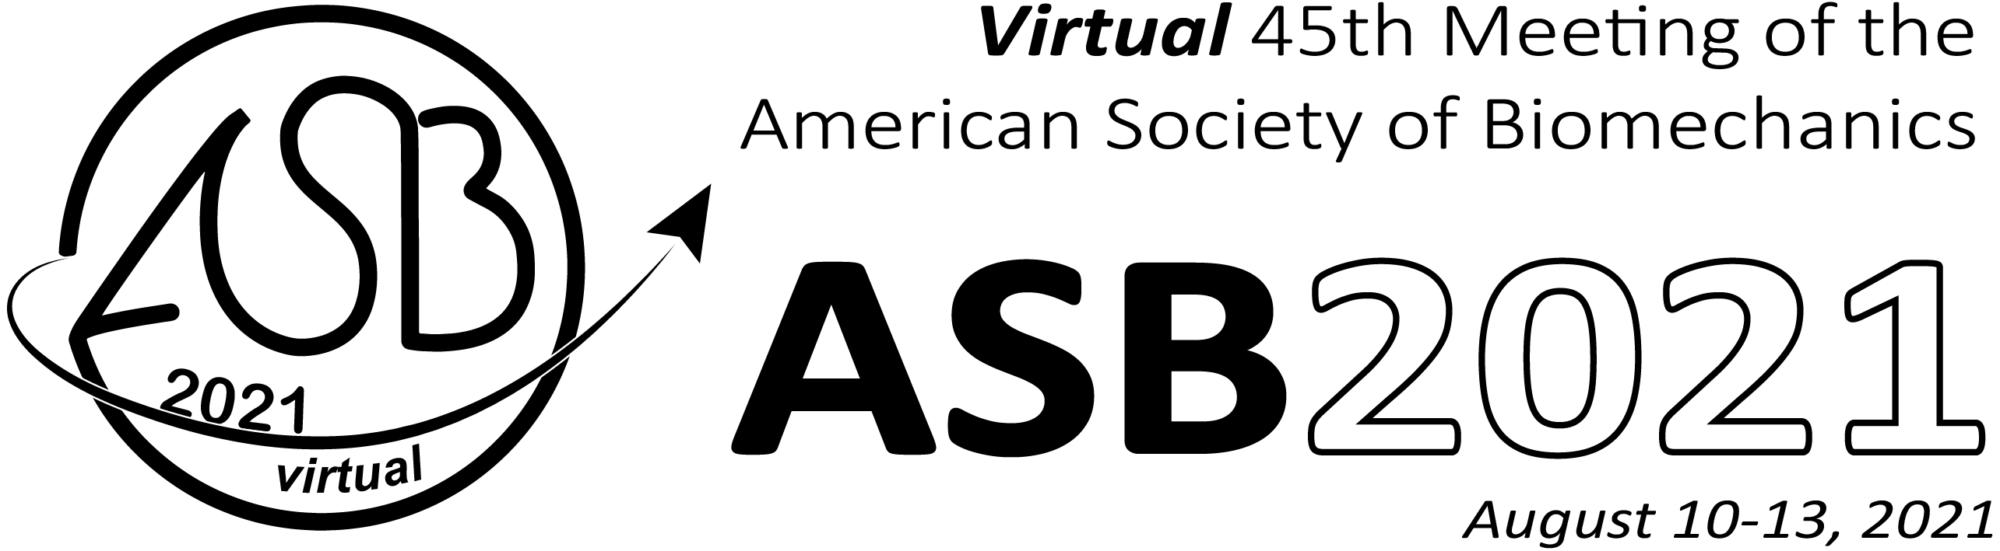 ASB 2021